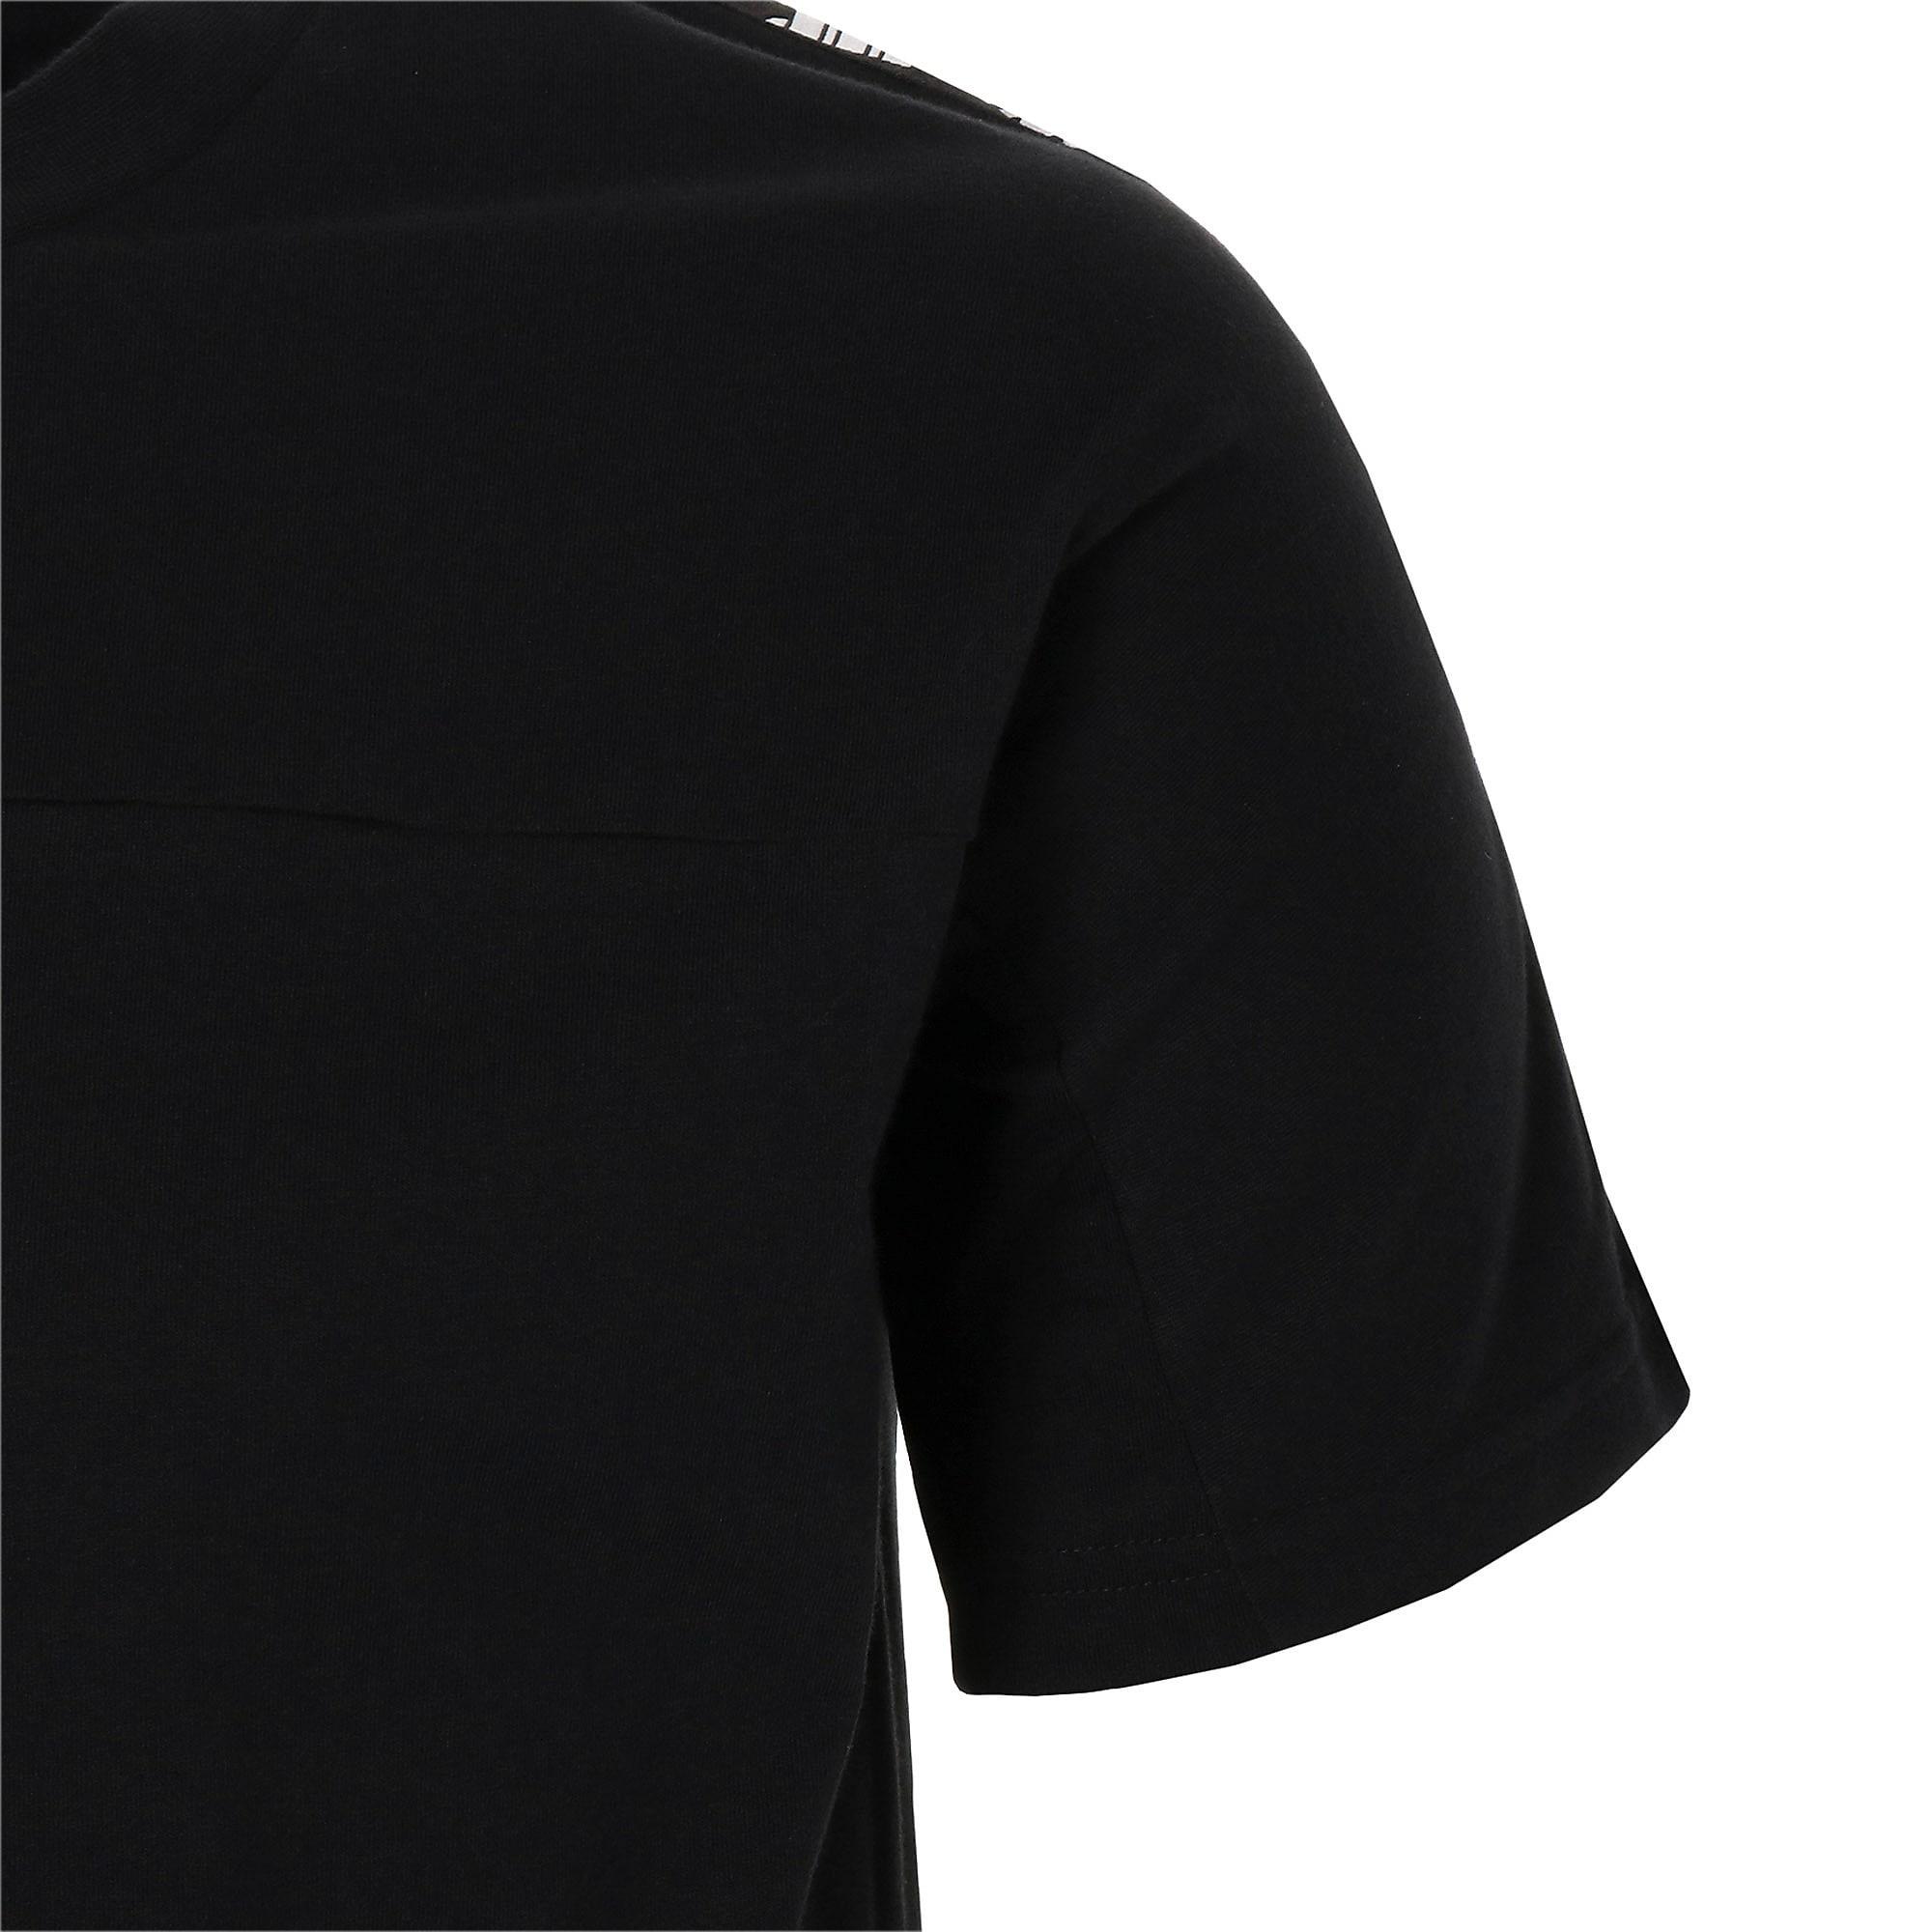 Thumbnail 8 of PUMA XTG SS Tシャツ, Puma Black, medium-JPN